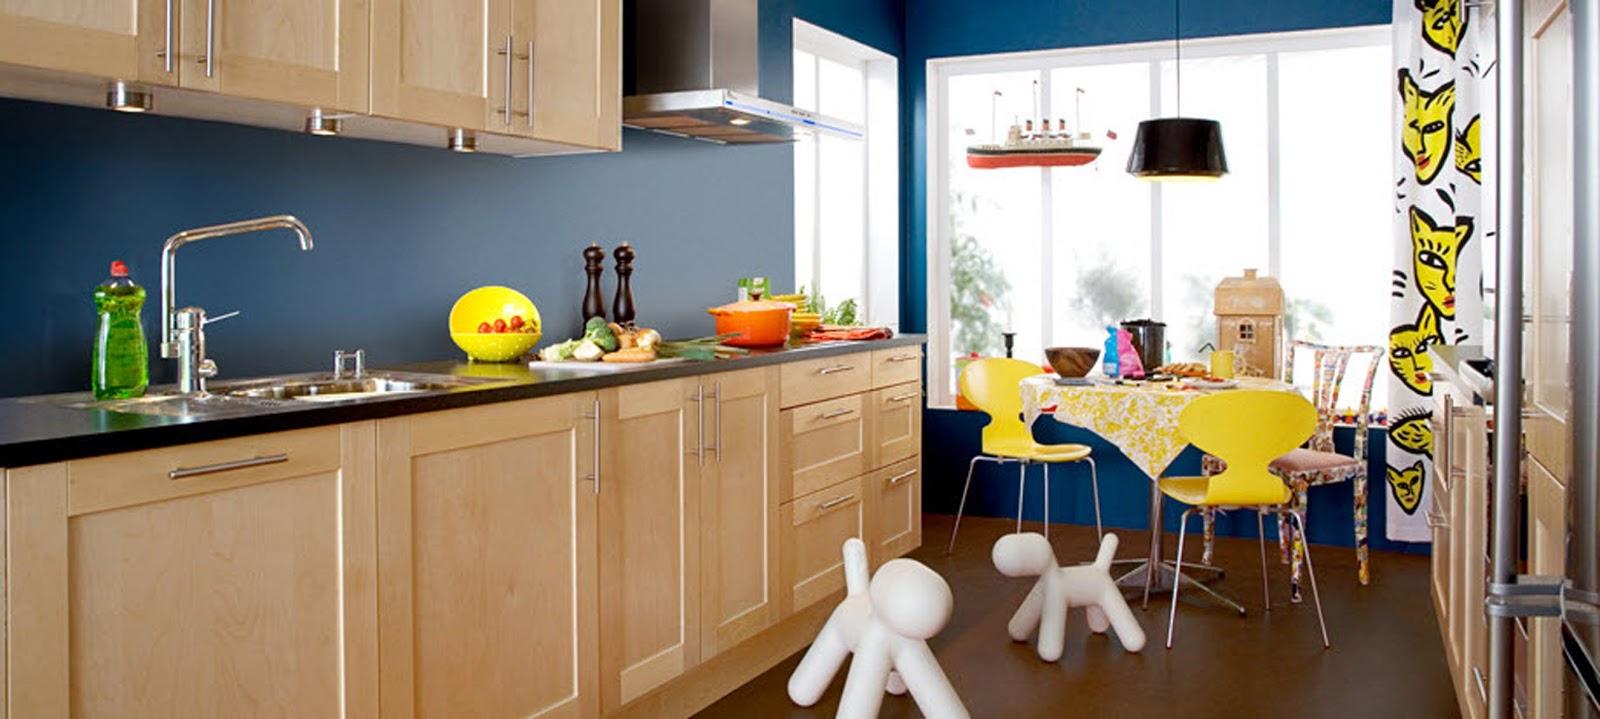 Jasa Pembuatan Kitchen Set Jati Belanda Jasa Kitchen Set Murah